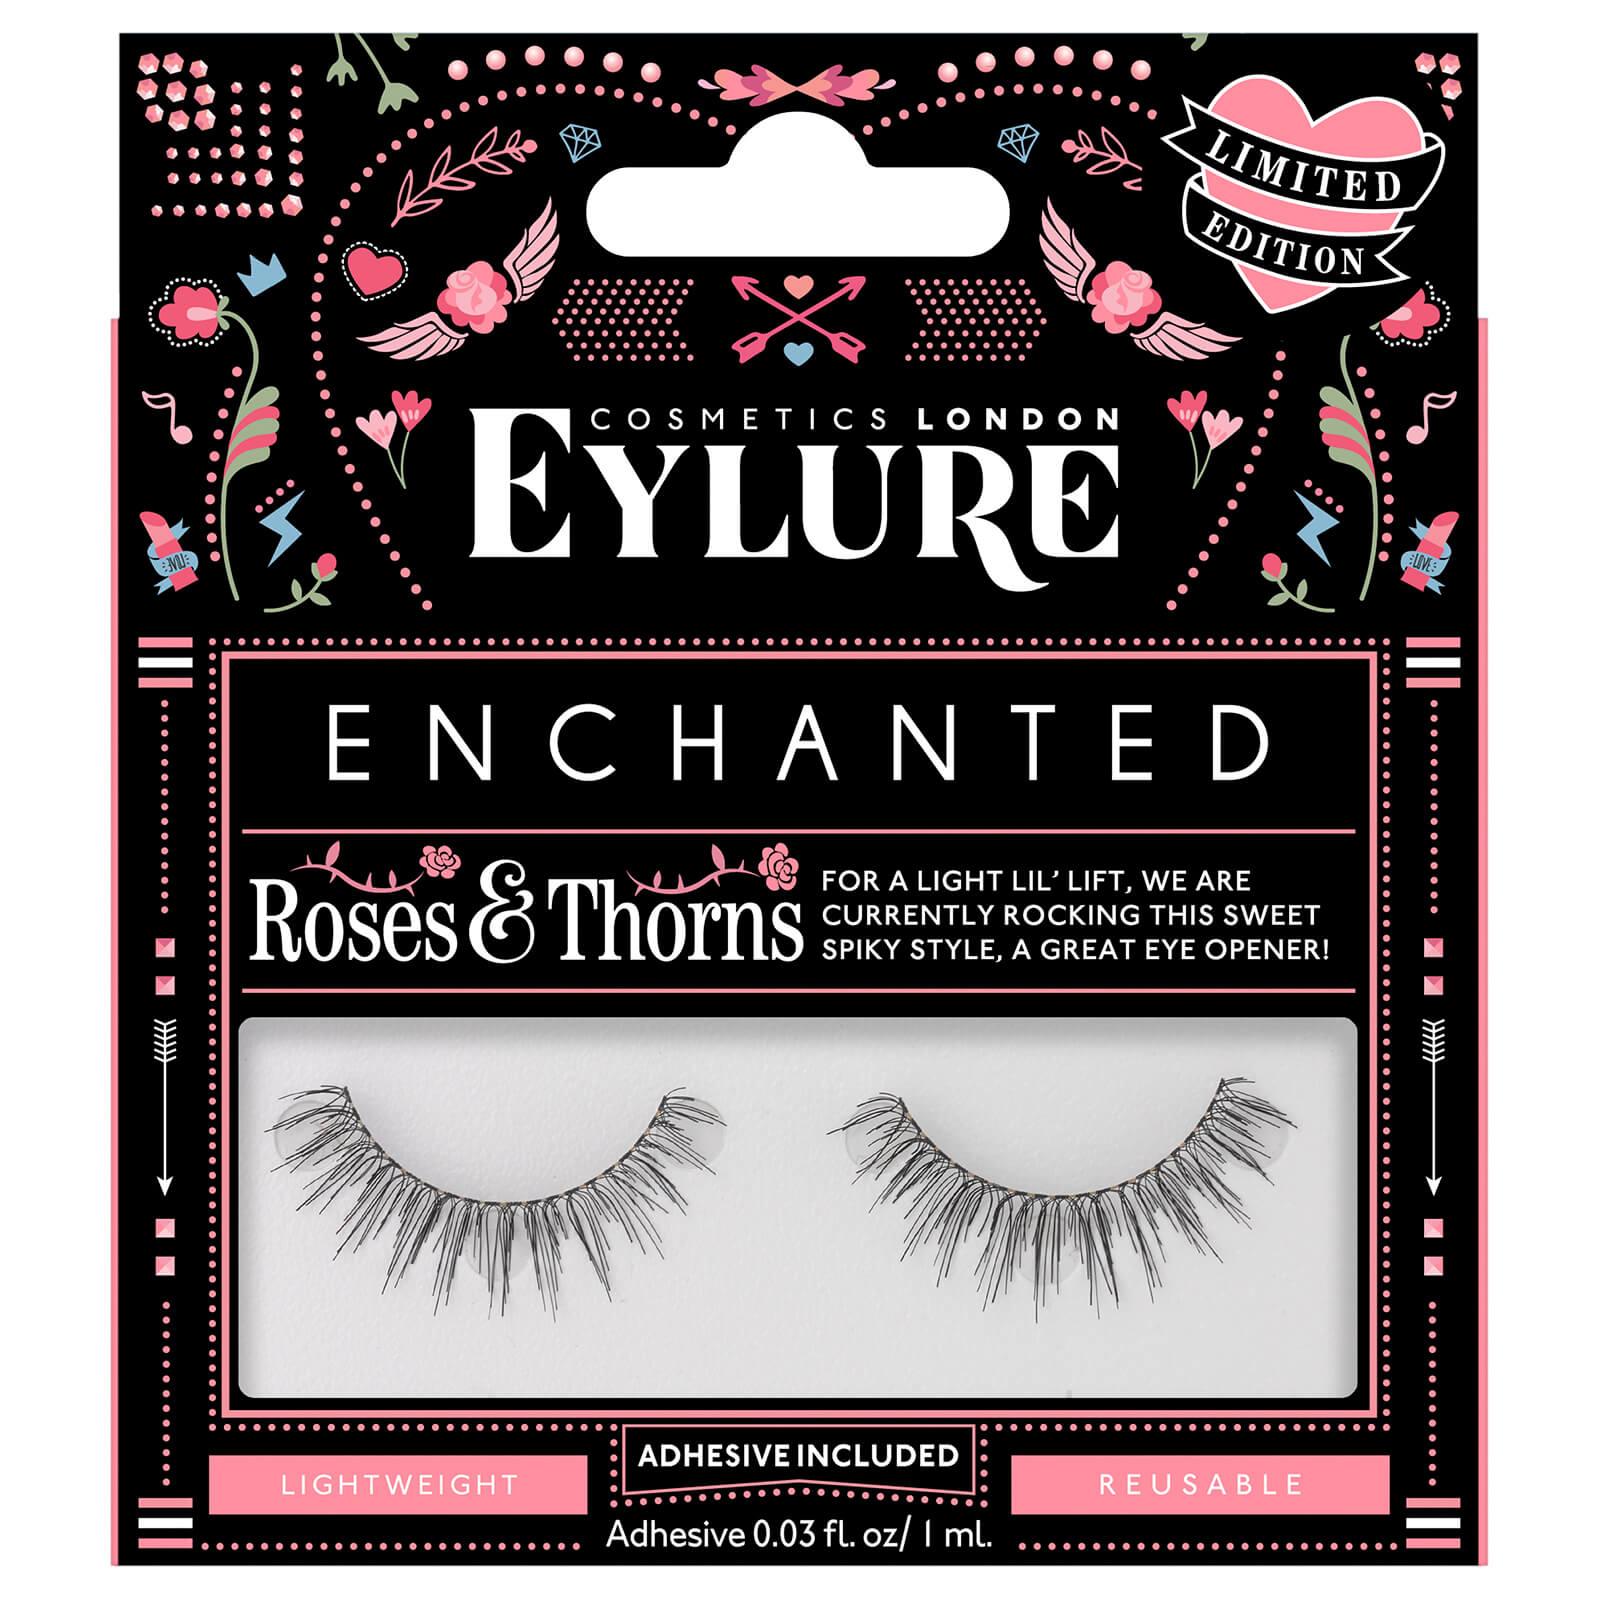 1c06daed435 Eylure Enchanted Lashes - Roses and Thorns | Free US Shipping |  lookfantastic